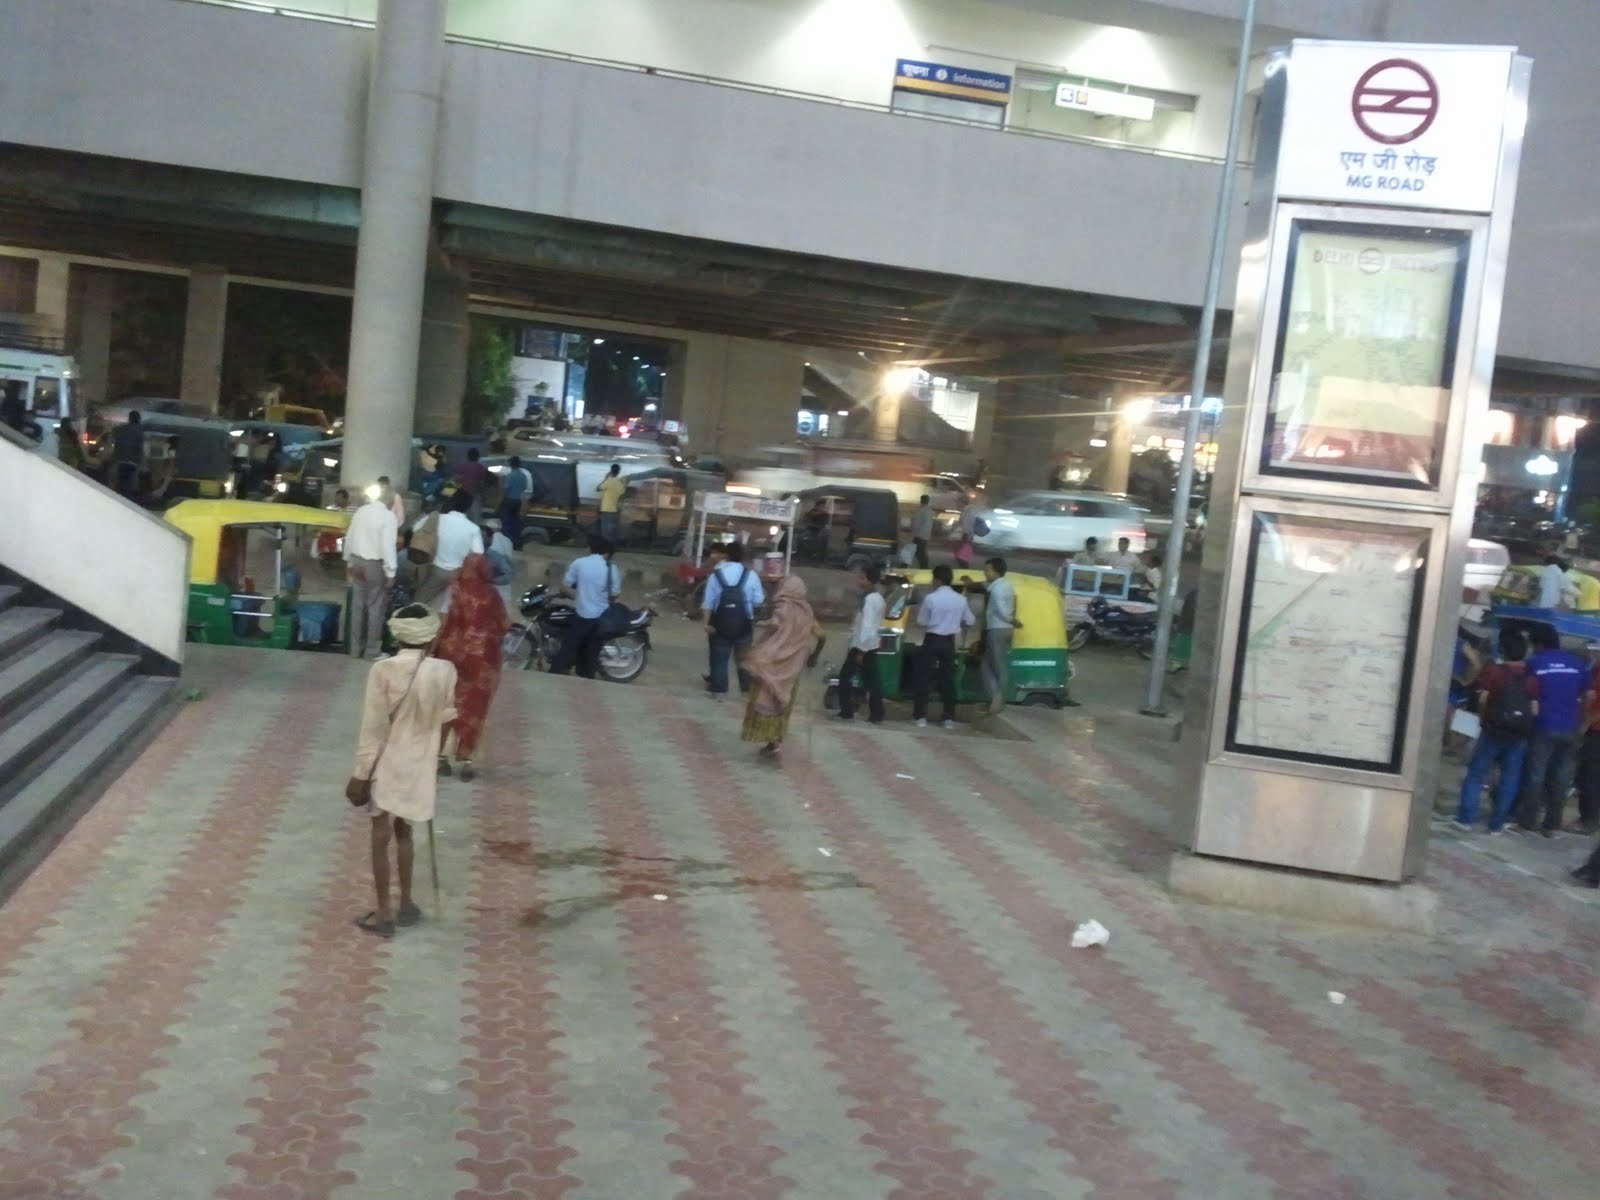 jugaad in delhi